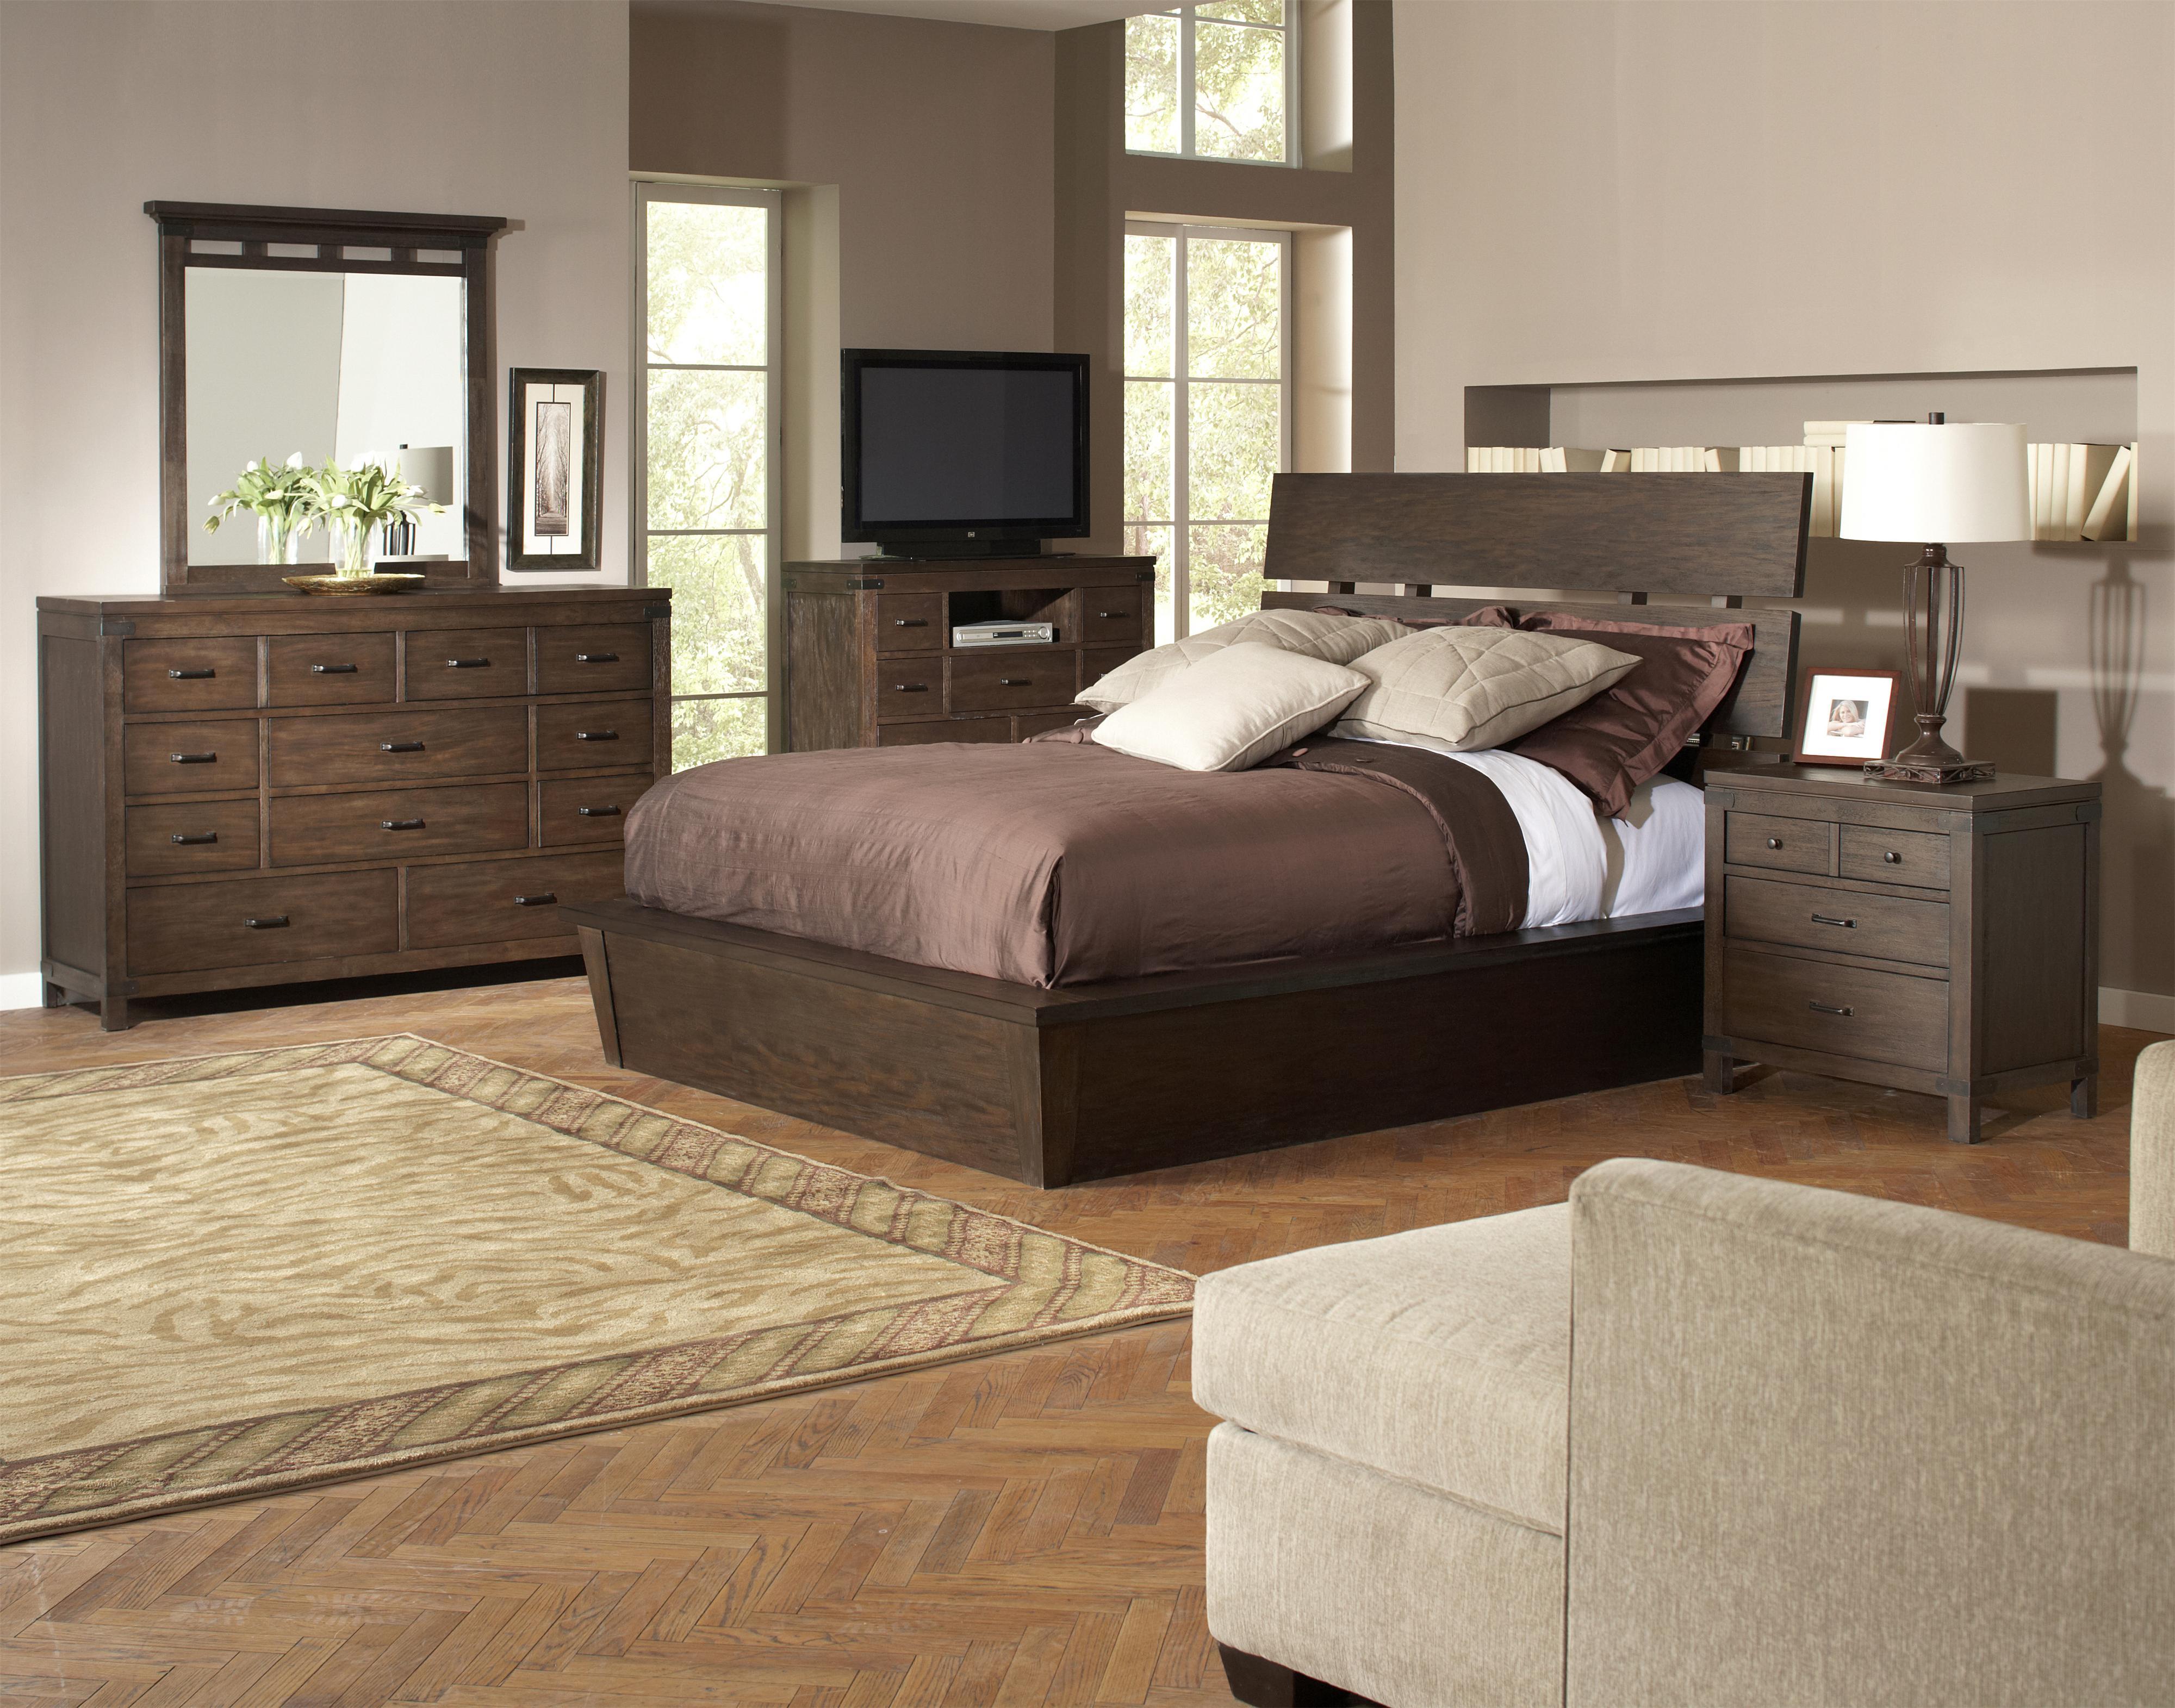 Riverside Furniture Promenade California King Bedroom Group Hudson 39 S Furniture Bedroom Groups